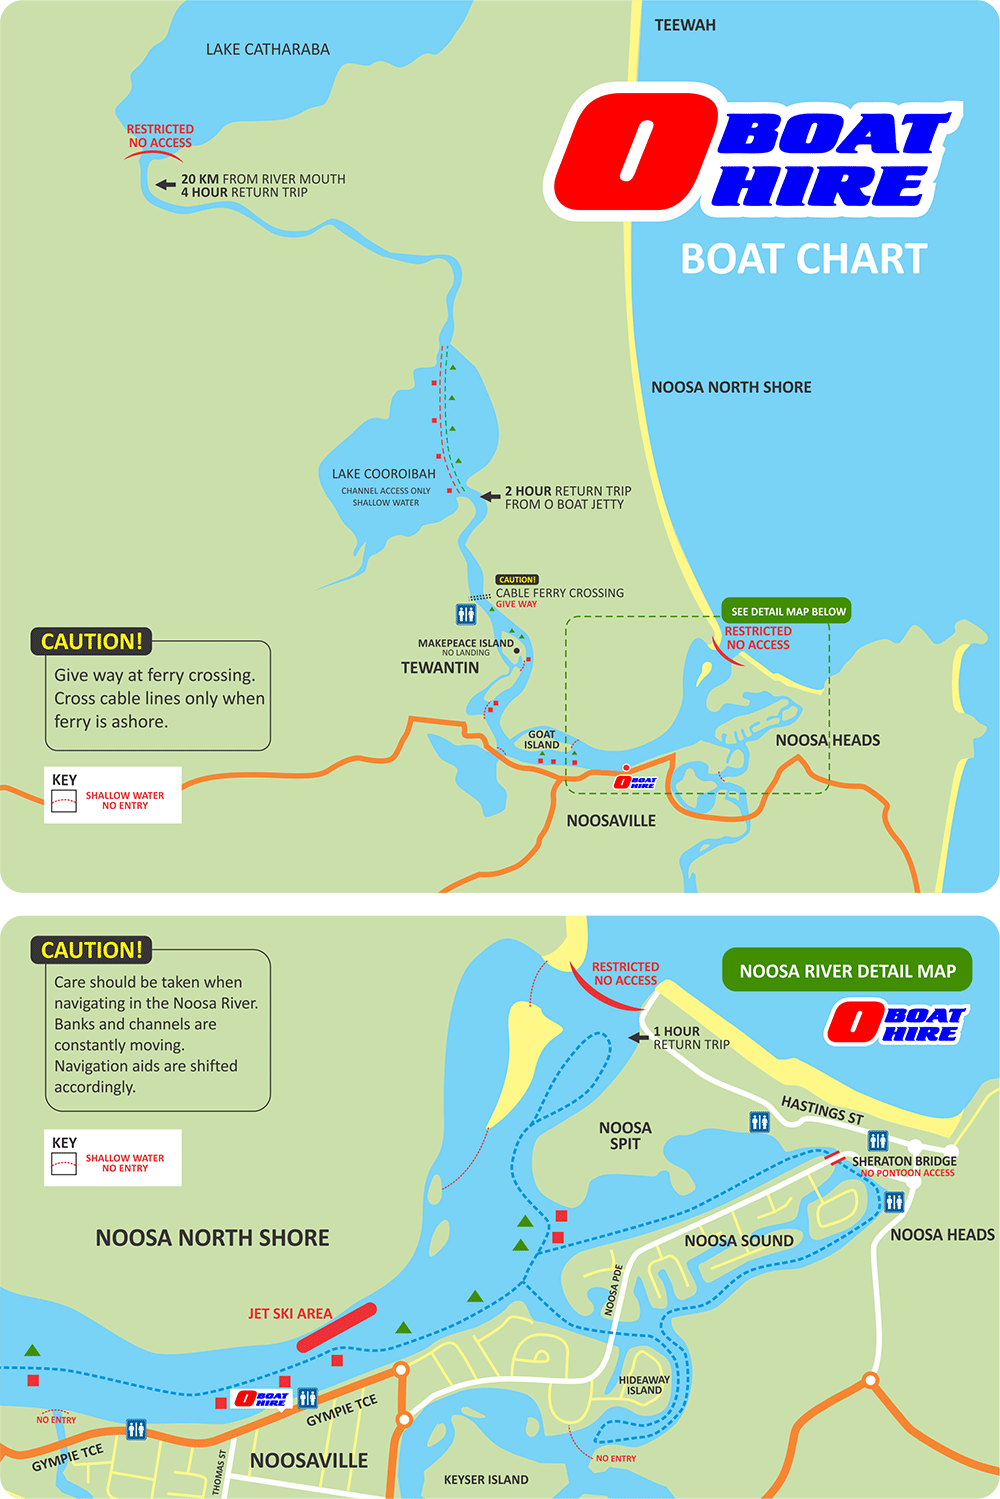 O Boat Hire Boat Chart